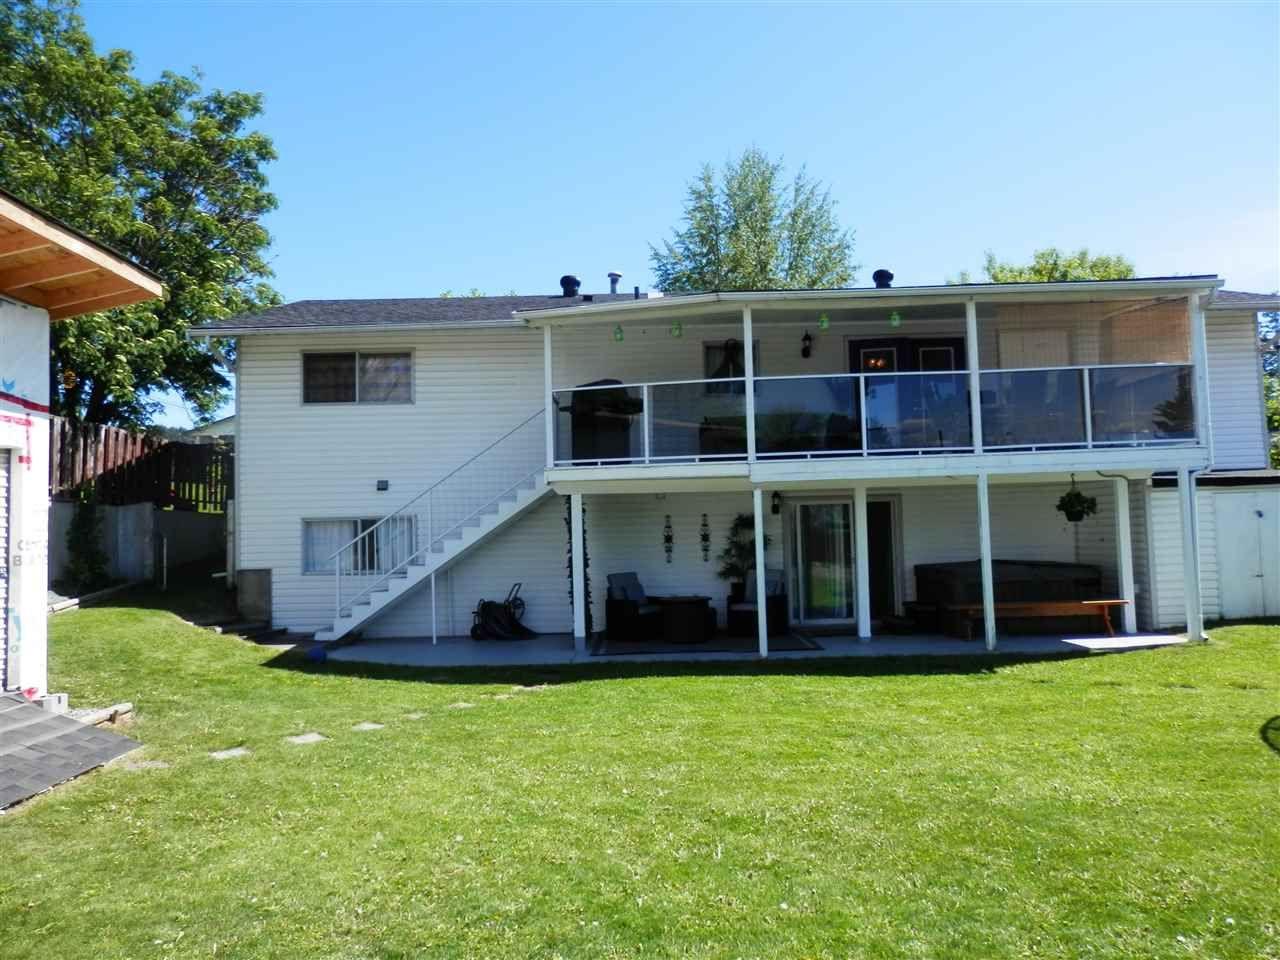 Photo 21: Photos: 783 PIGEON Avenue in Williams Lake: Williams Lake - City House for sale (Williams Lake (Zone 27))  : MLS®# R2459919